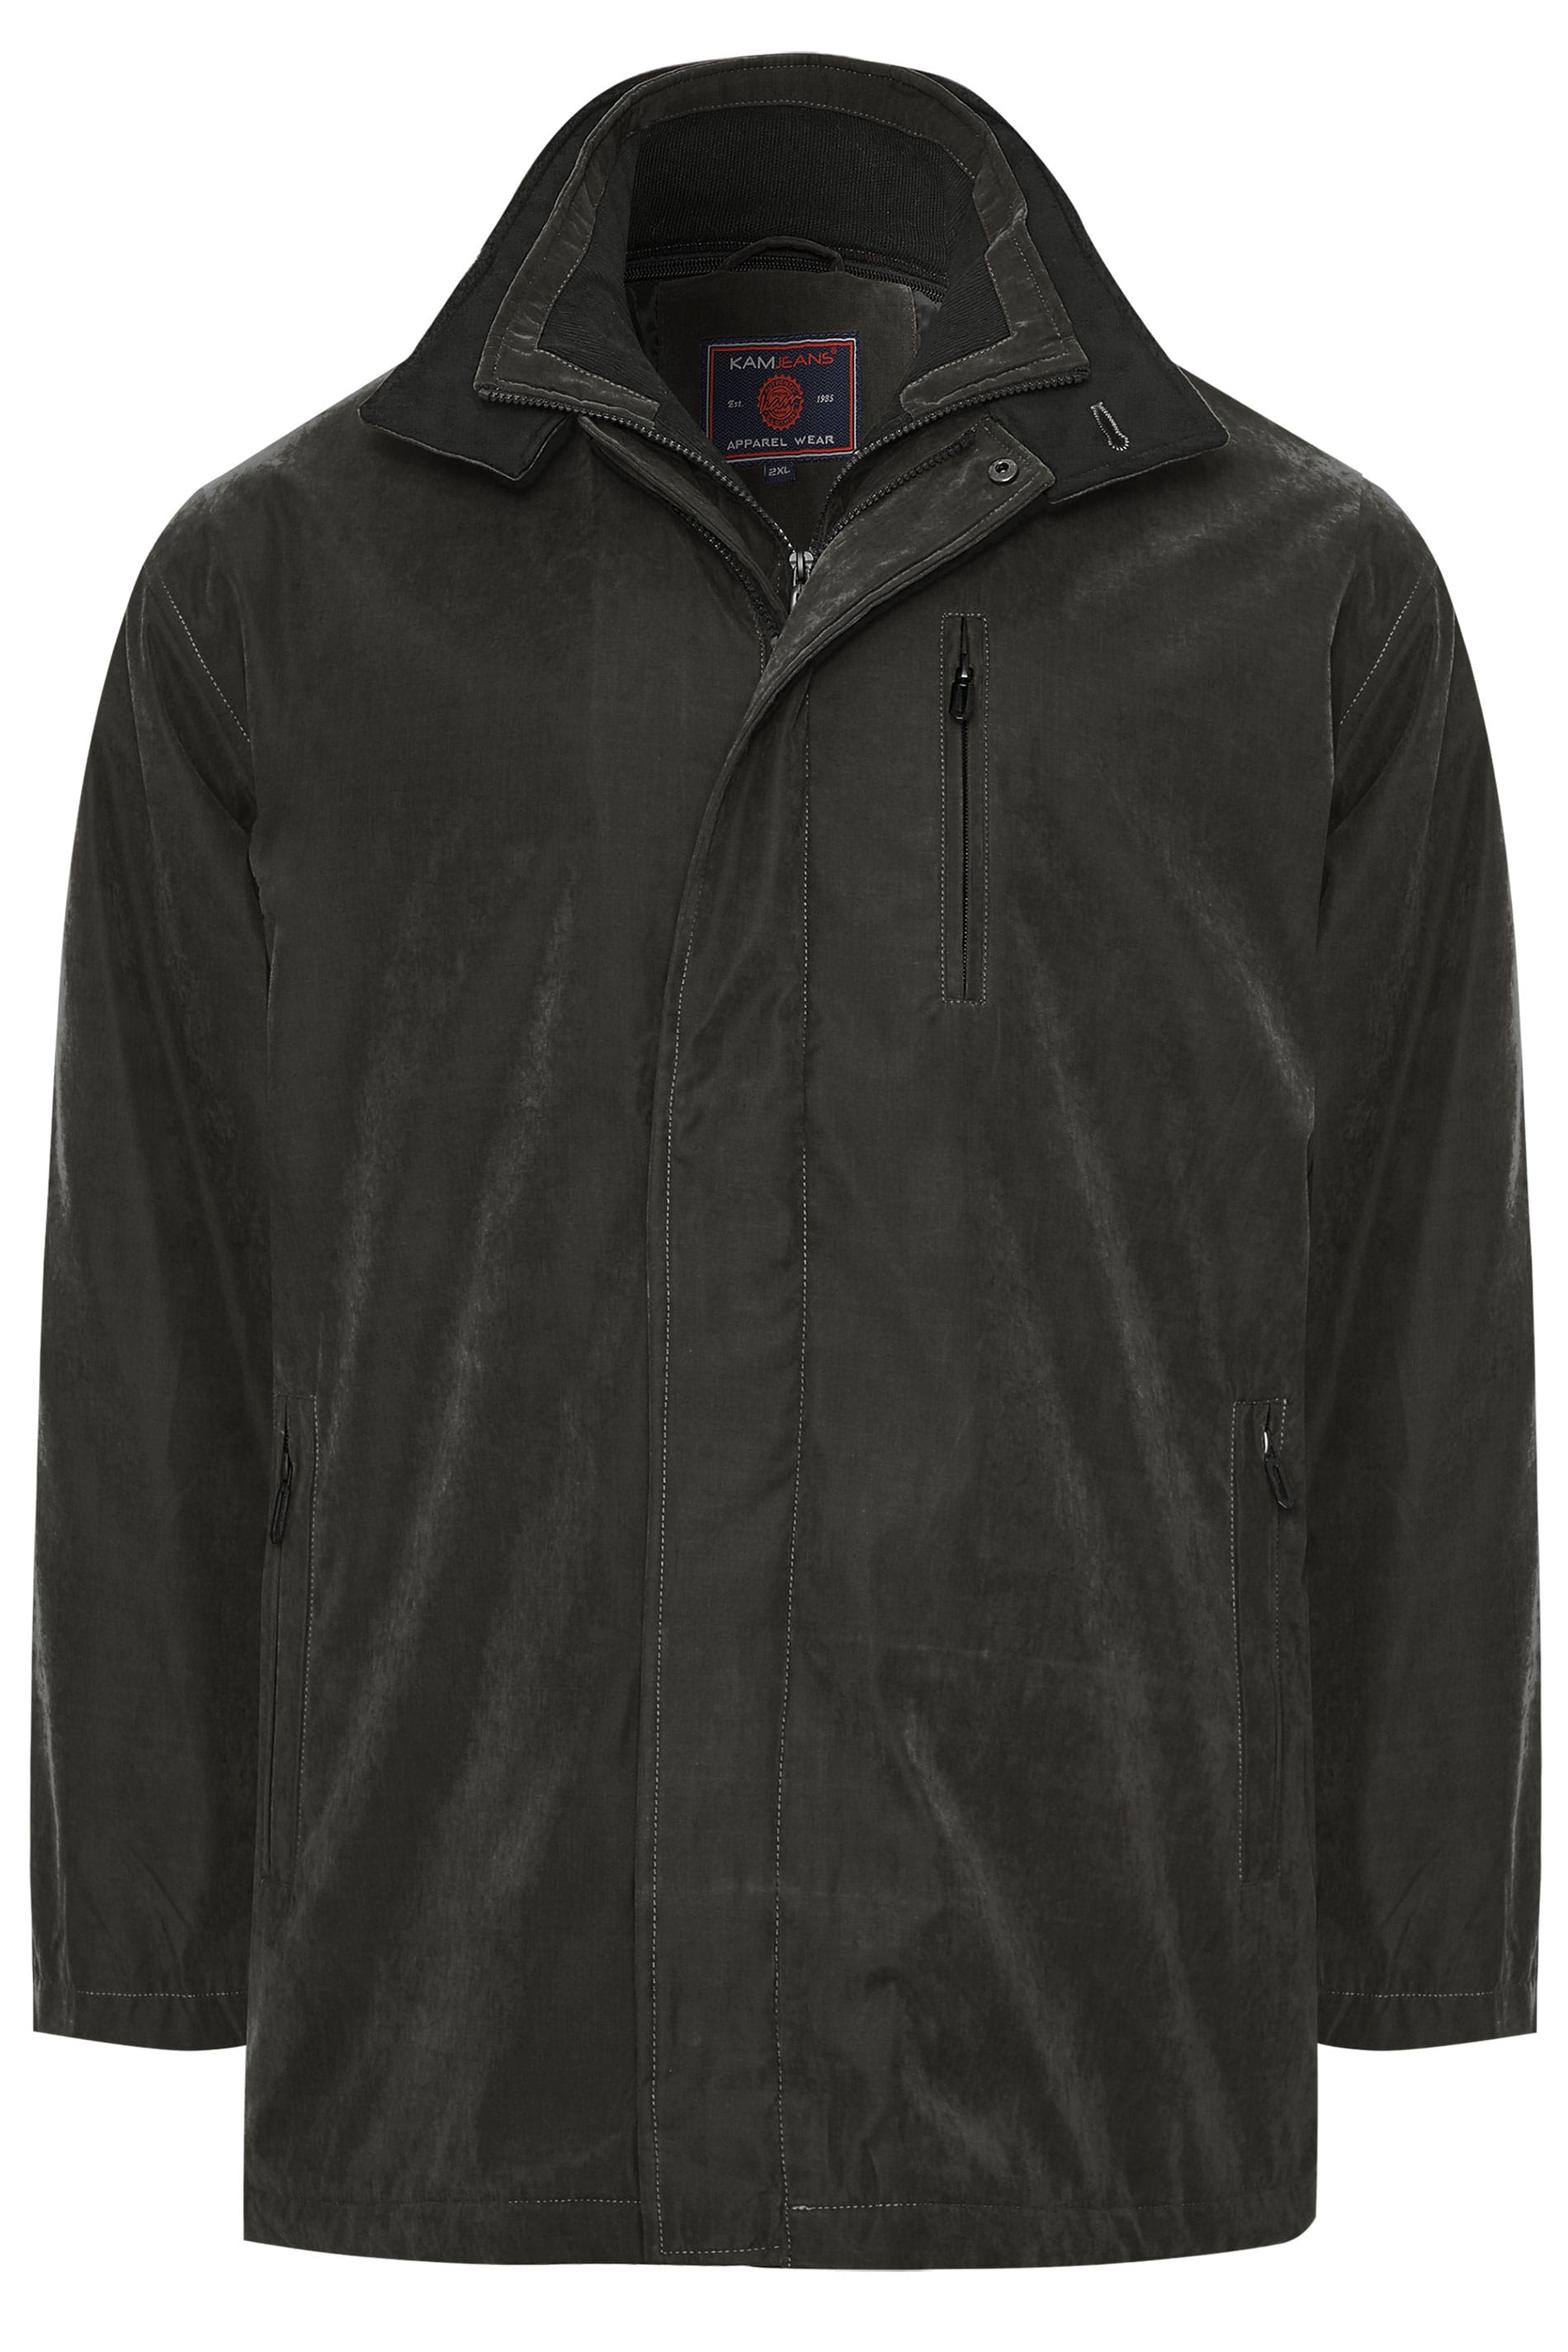 KAM Black Faux Suede Jacket